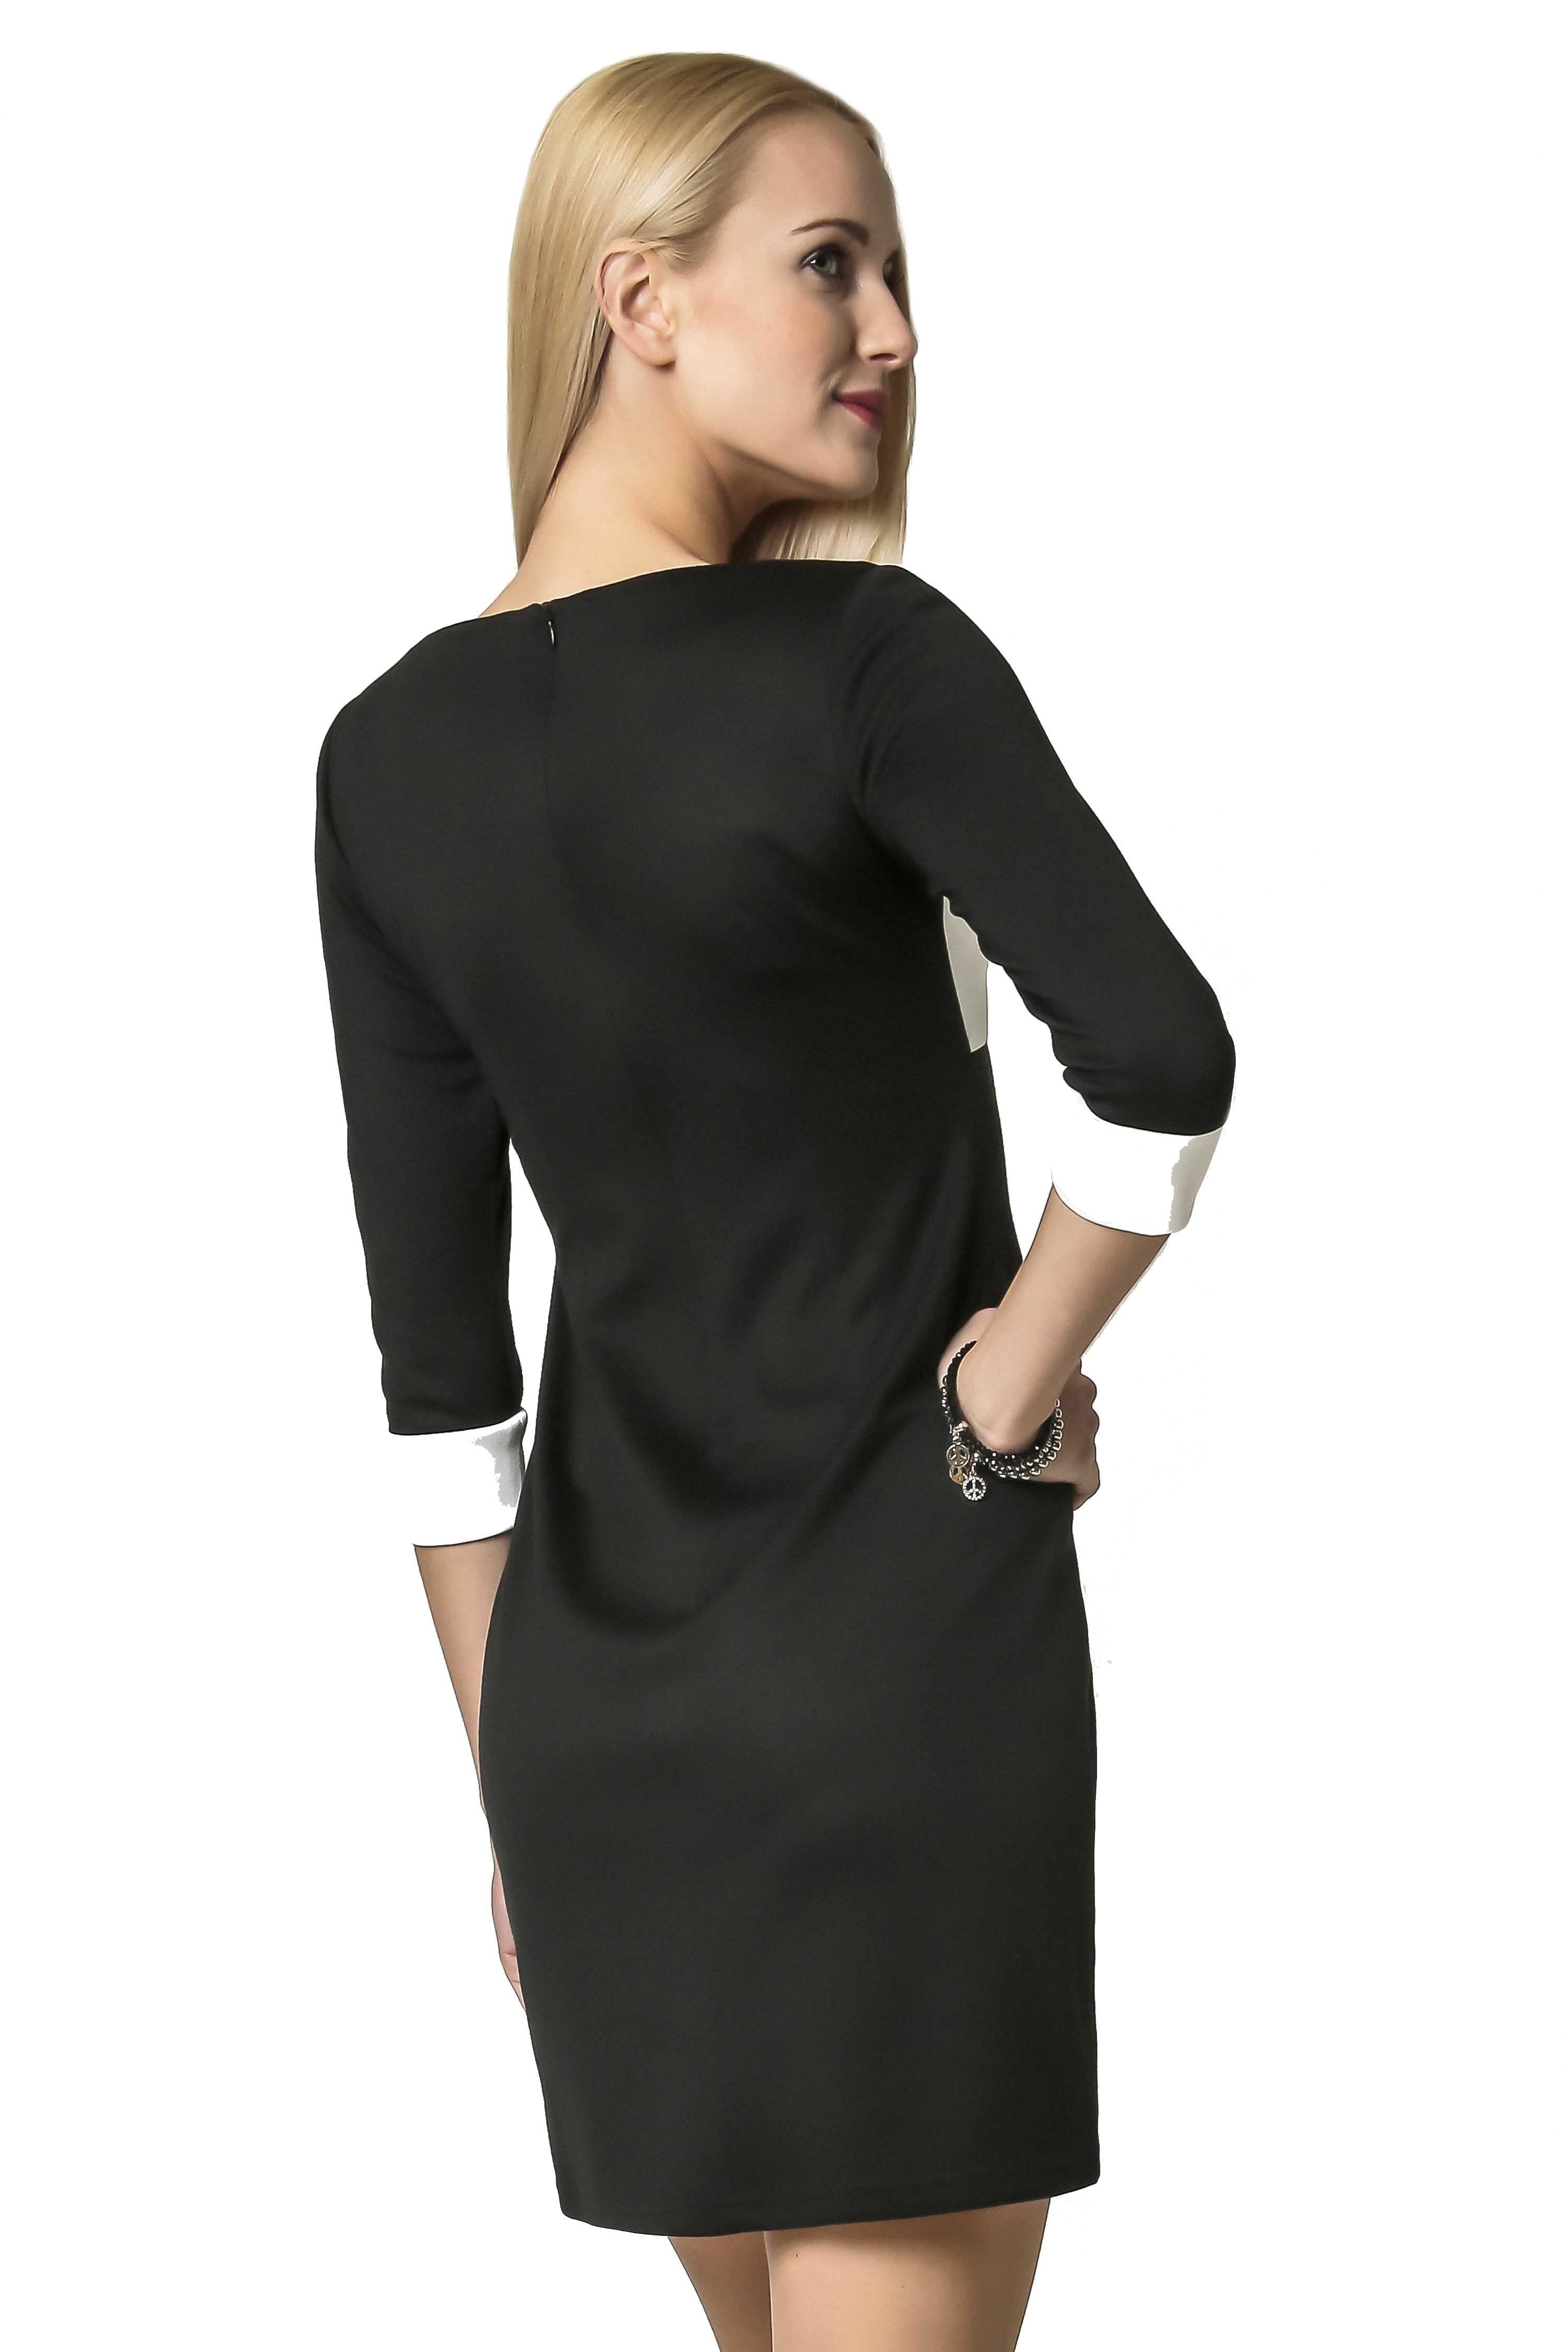 Jeanette dress in black with ecru